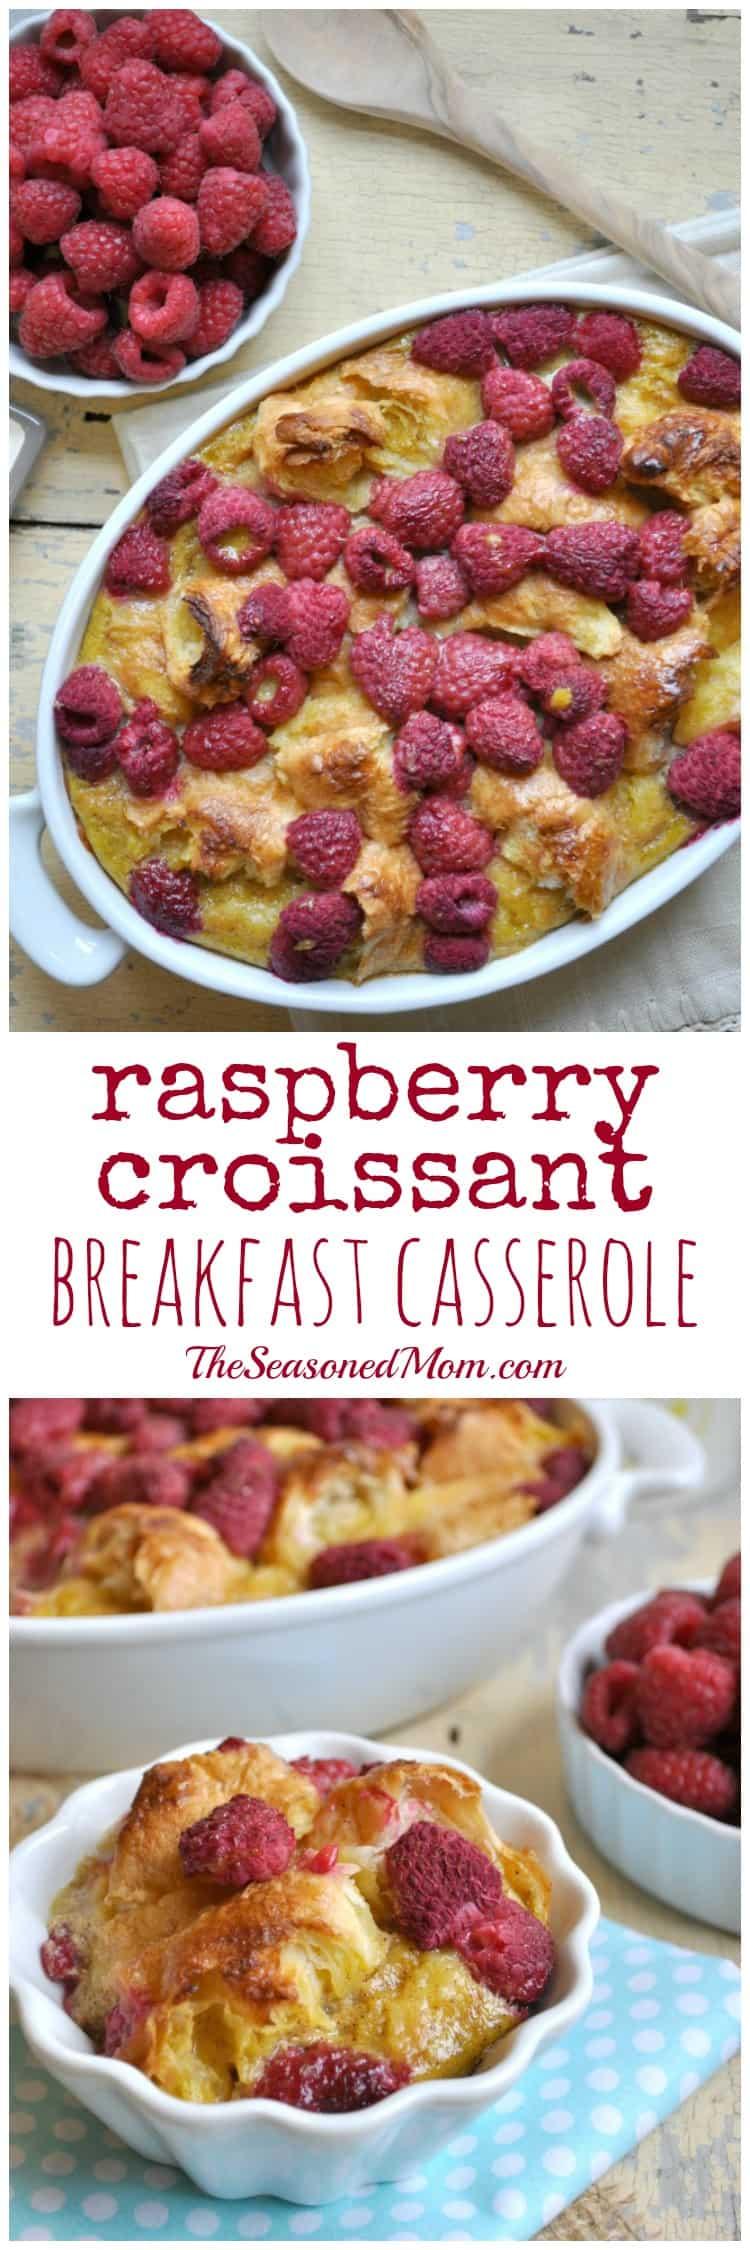 Raspberry Croissant Breakfast Casserole